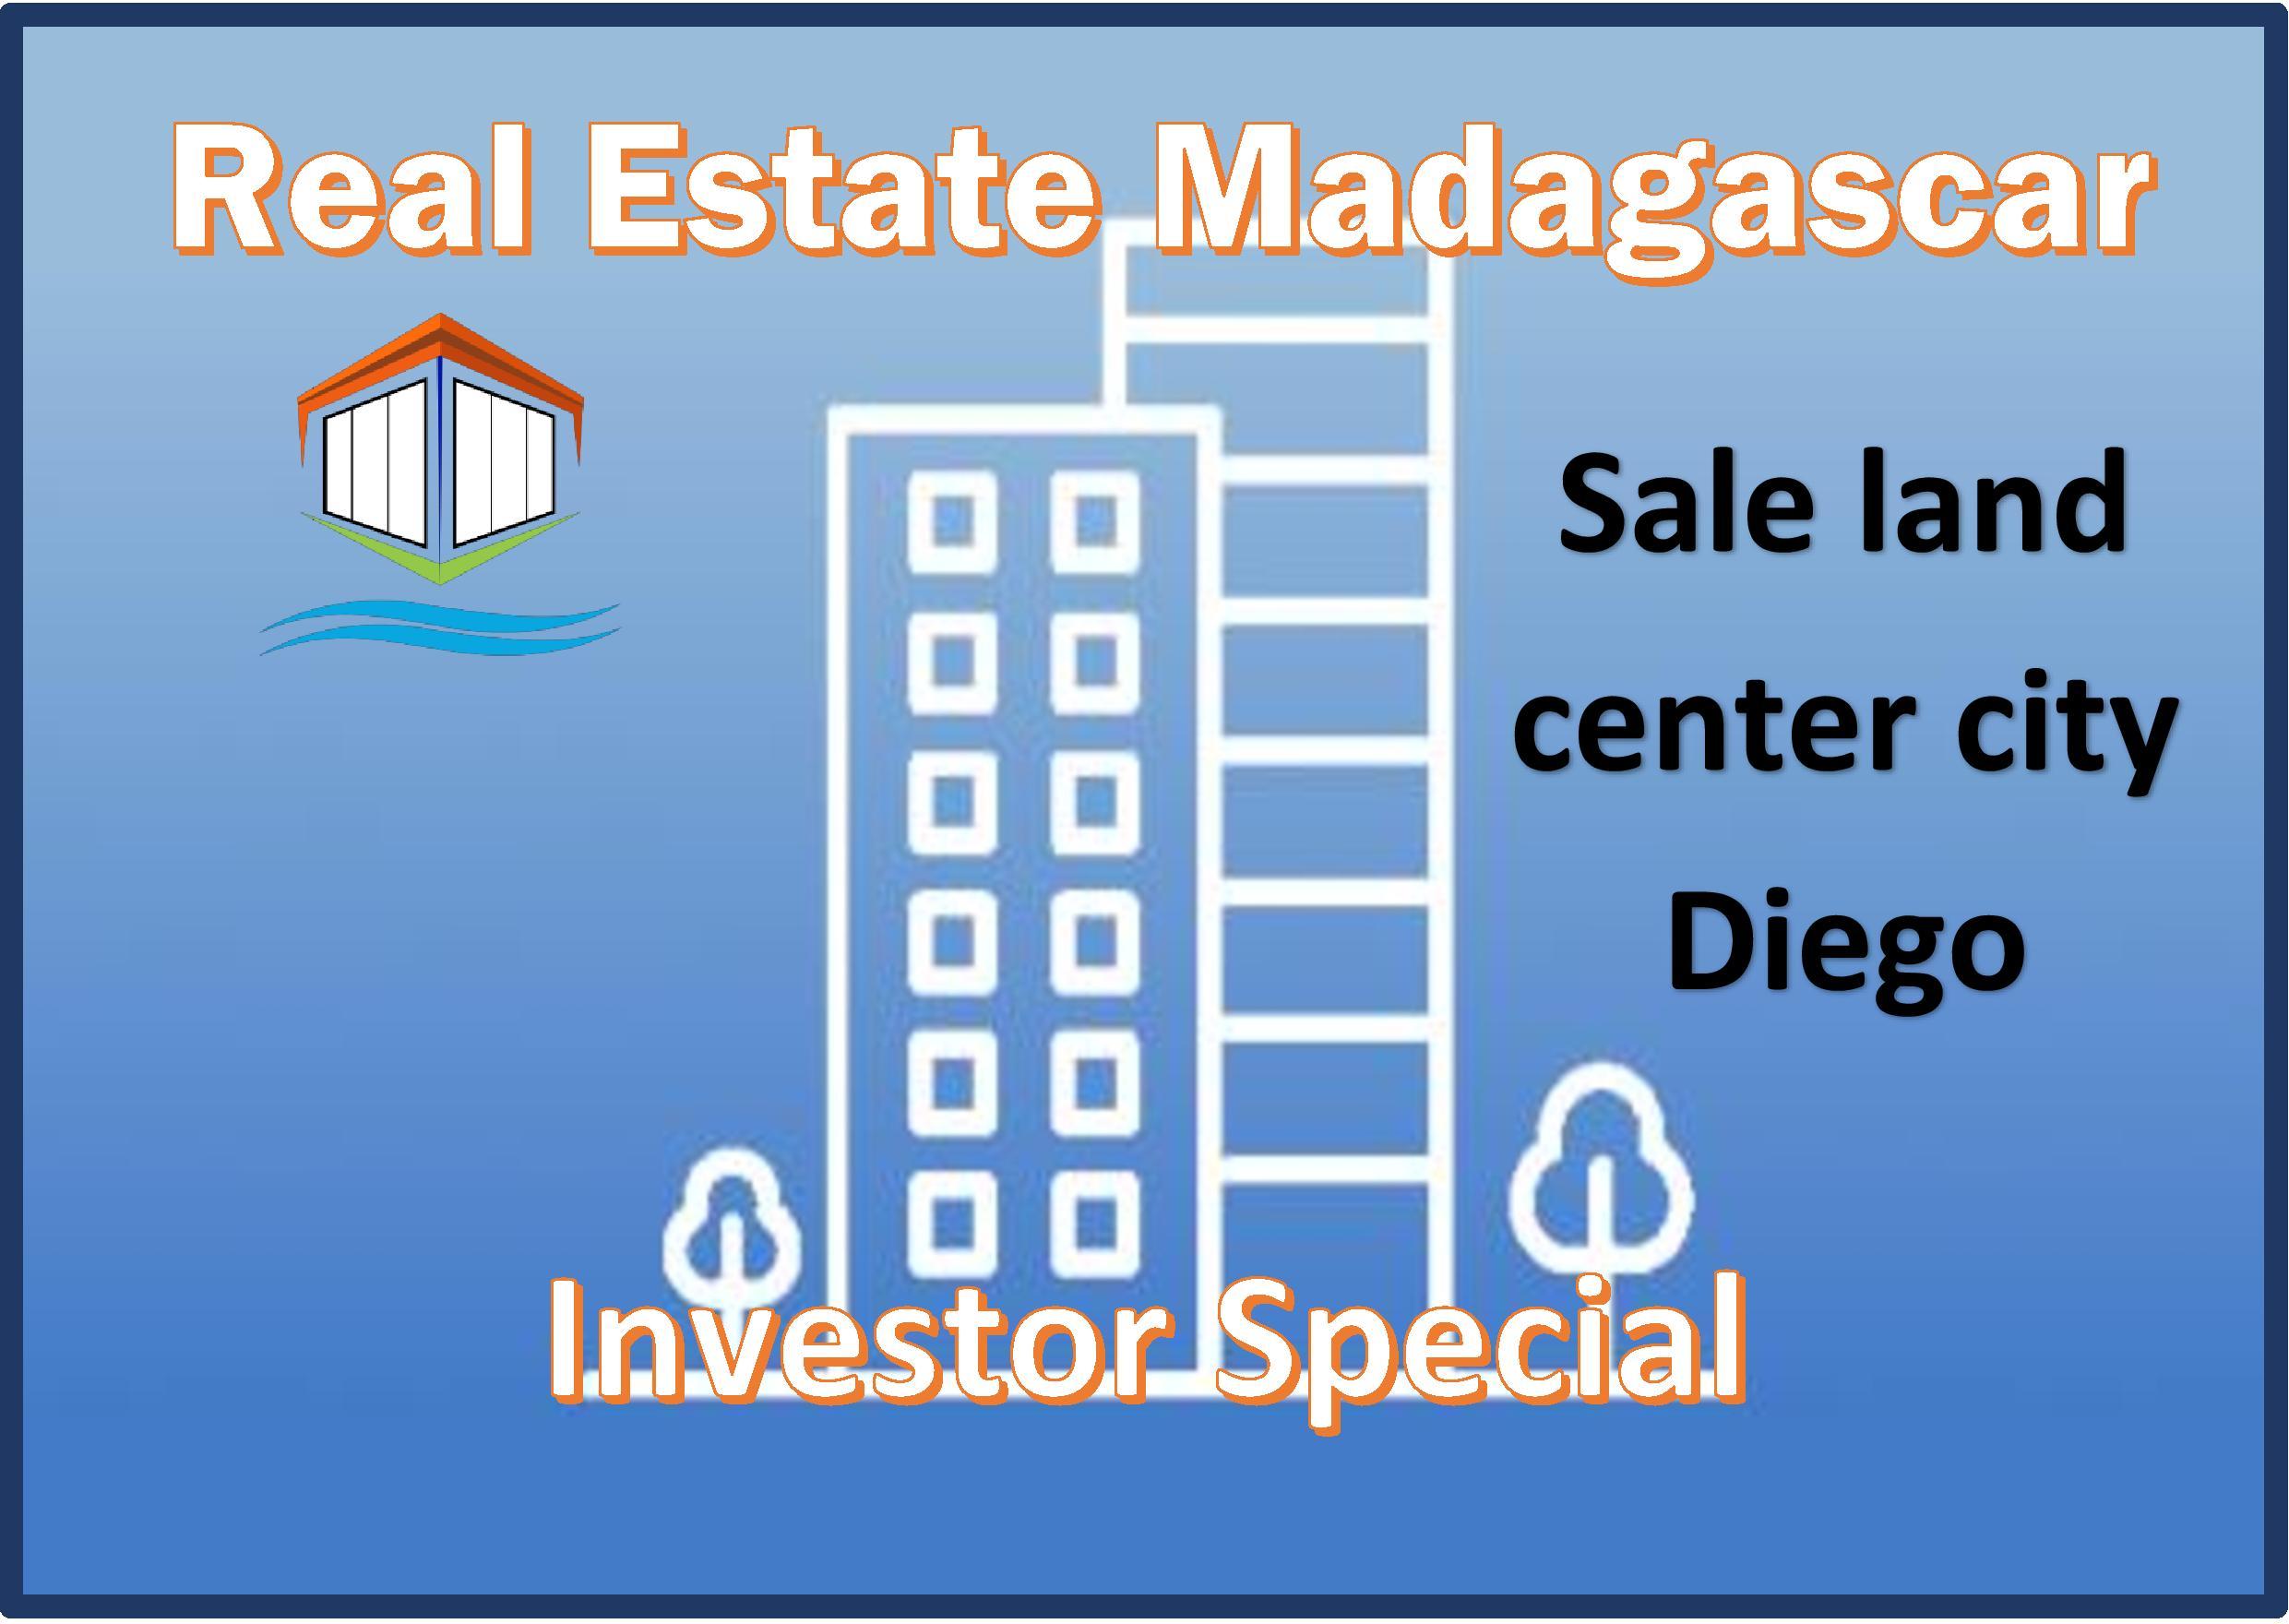 special-investor-sale-land-1.jpg